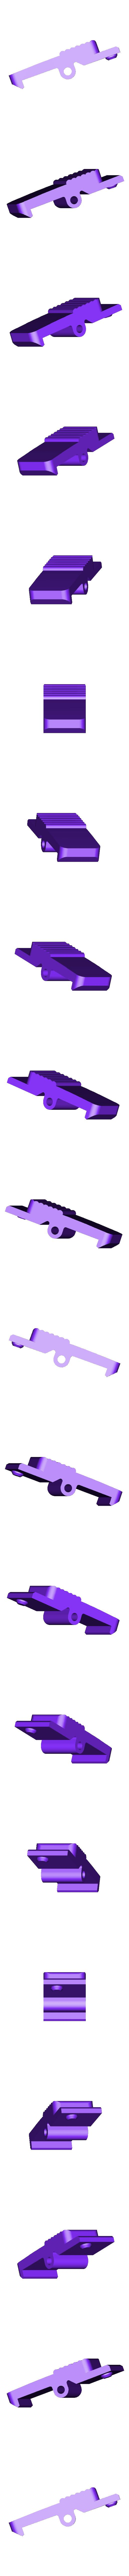 LOCK.stl Download STL file Fully working toy vacuum cleaner  • 3D printable design, kozakm